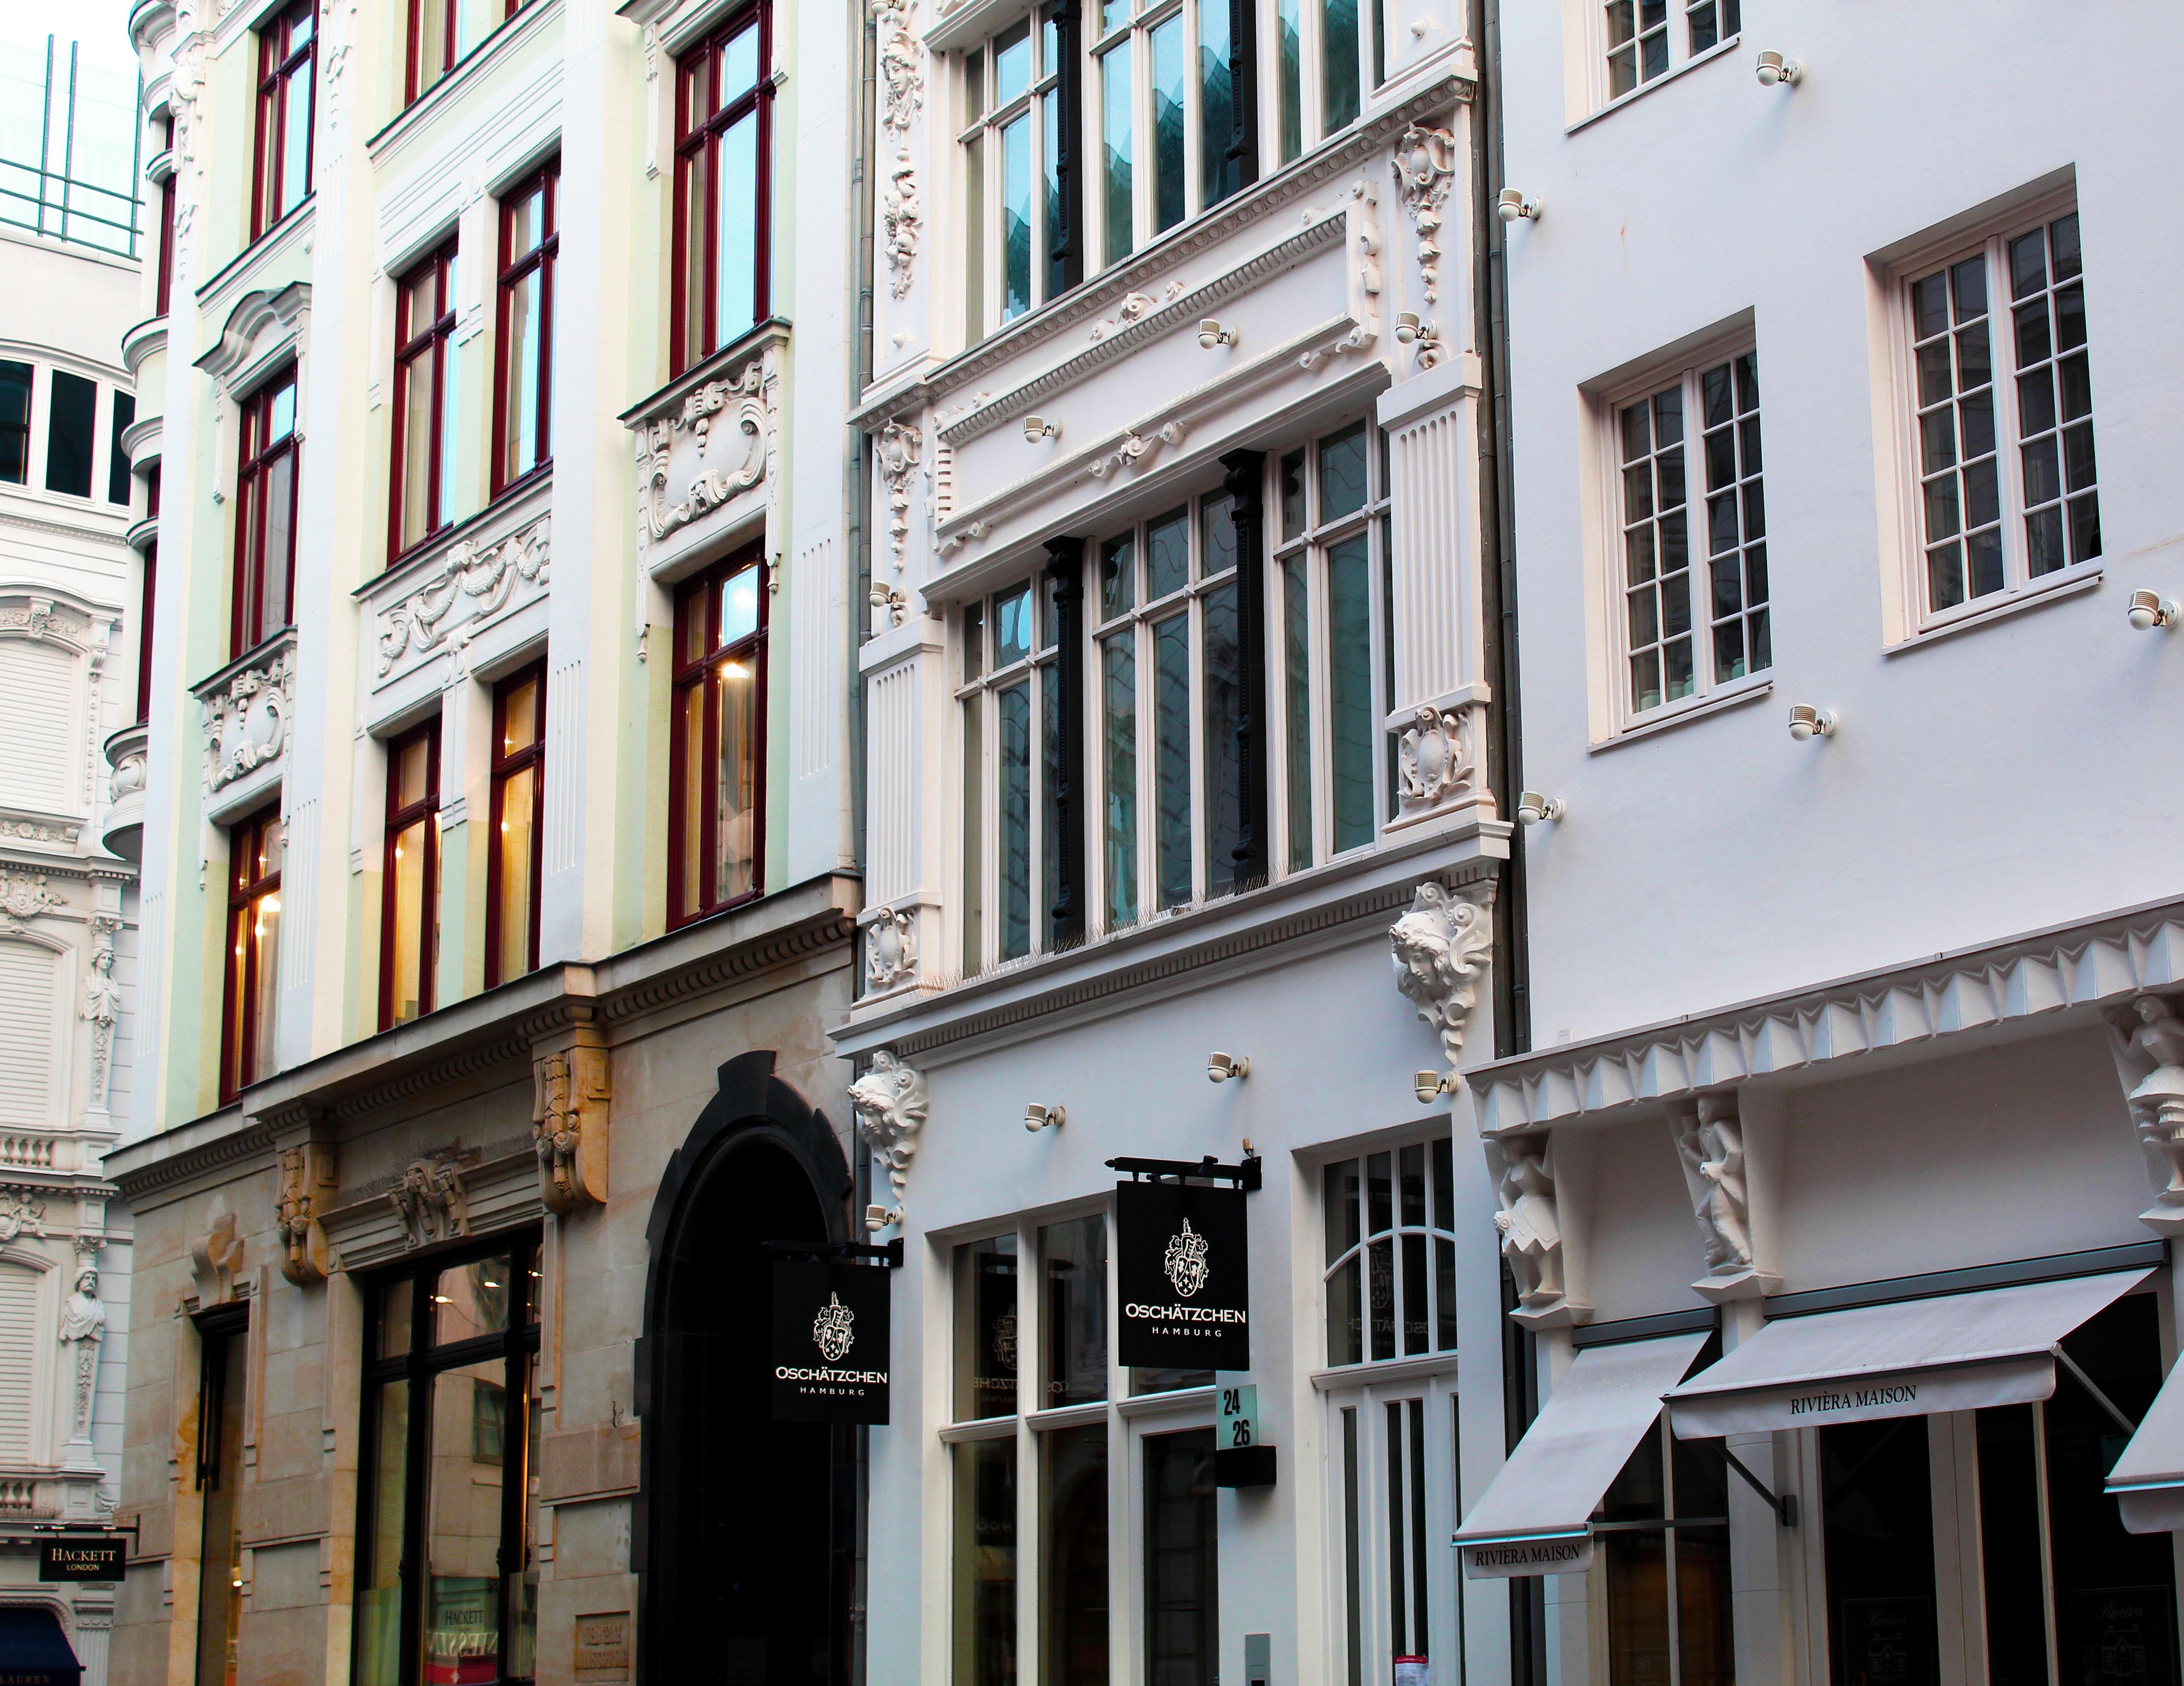 Hamburg | www.jclynmtrk.com